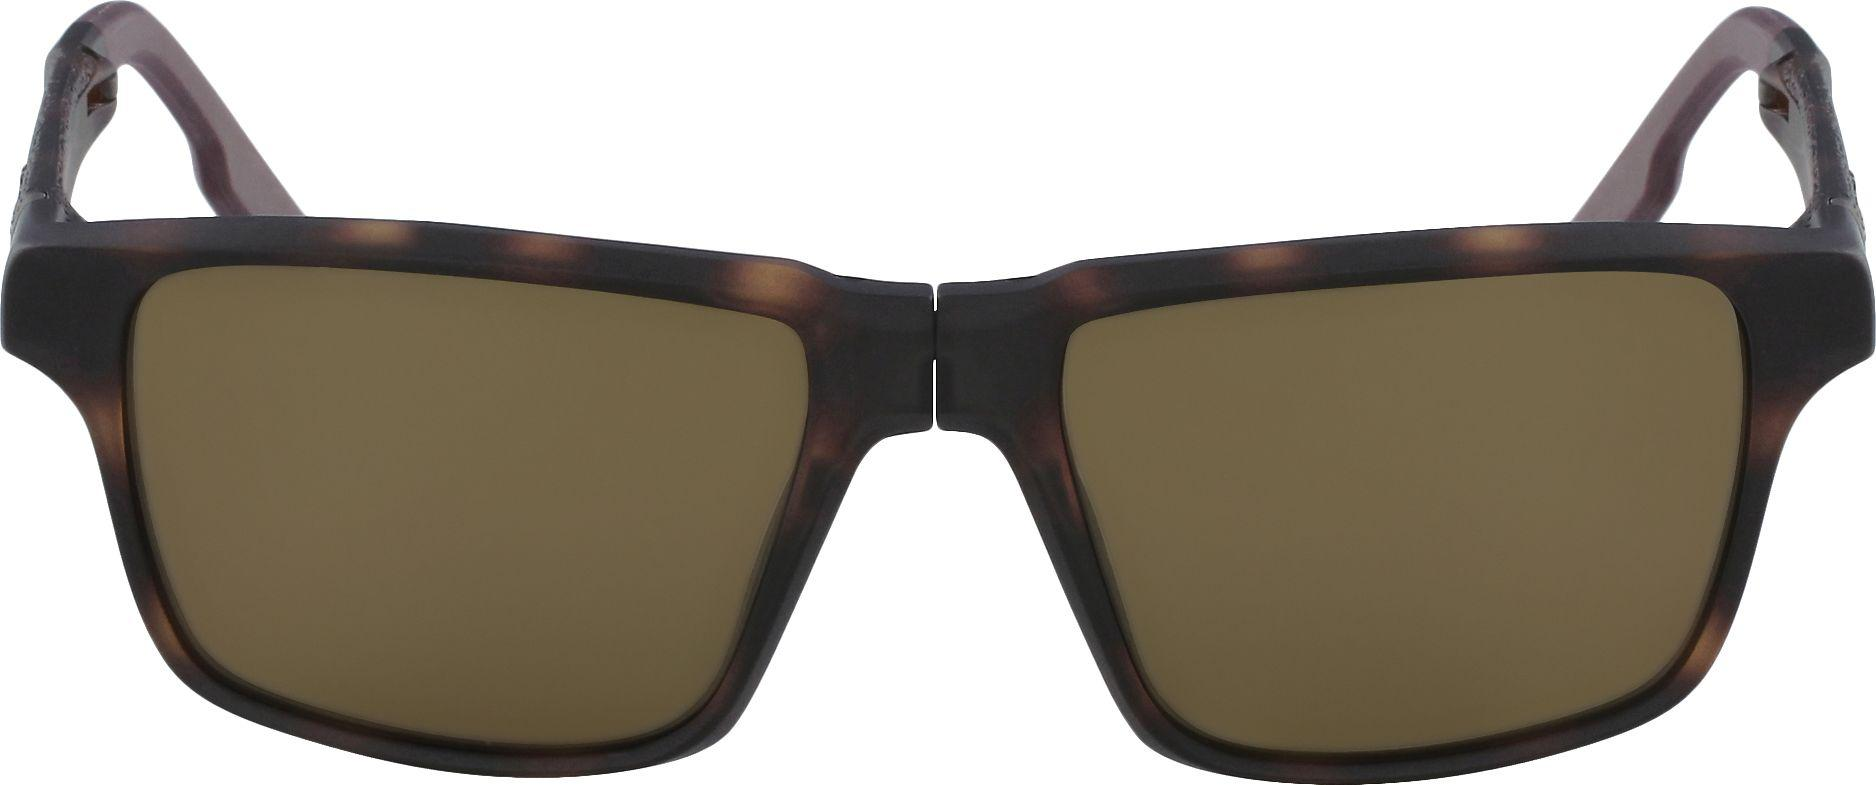 e8aa90ee85 Columbia - Brown Peak Freak Sunglasses for Men - Lyst. View fullscreen